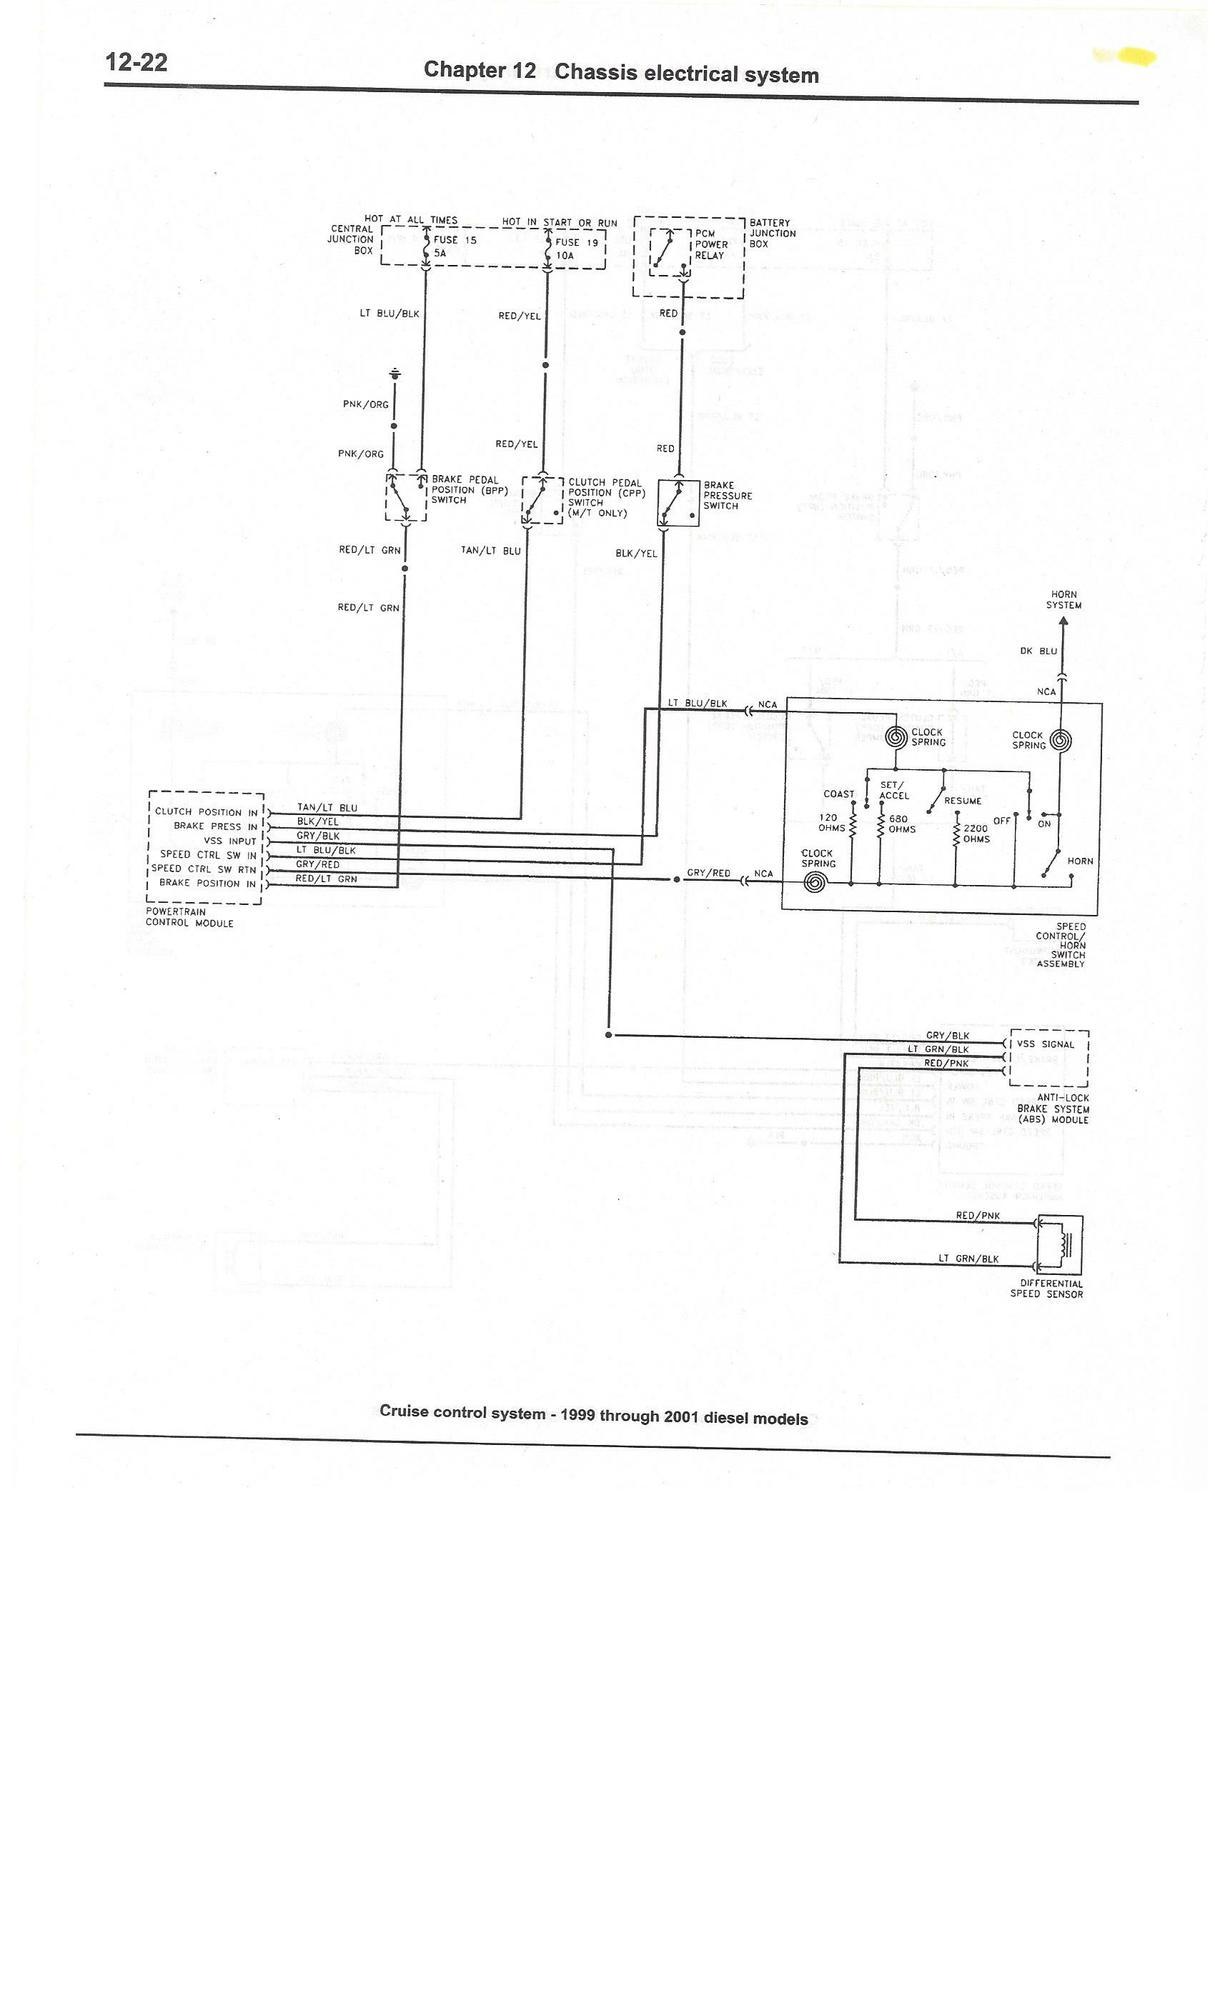 2003 excursion wiring diagram fn 3954  v8 engine control diagram schematic wiring  v8 engine control diagram schematic wiring